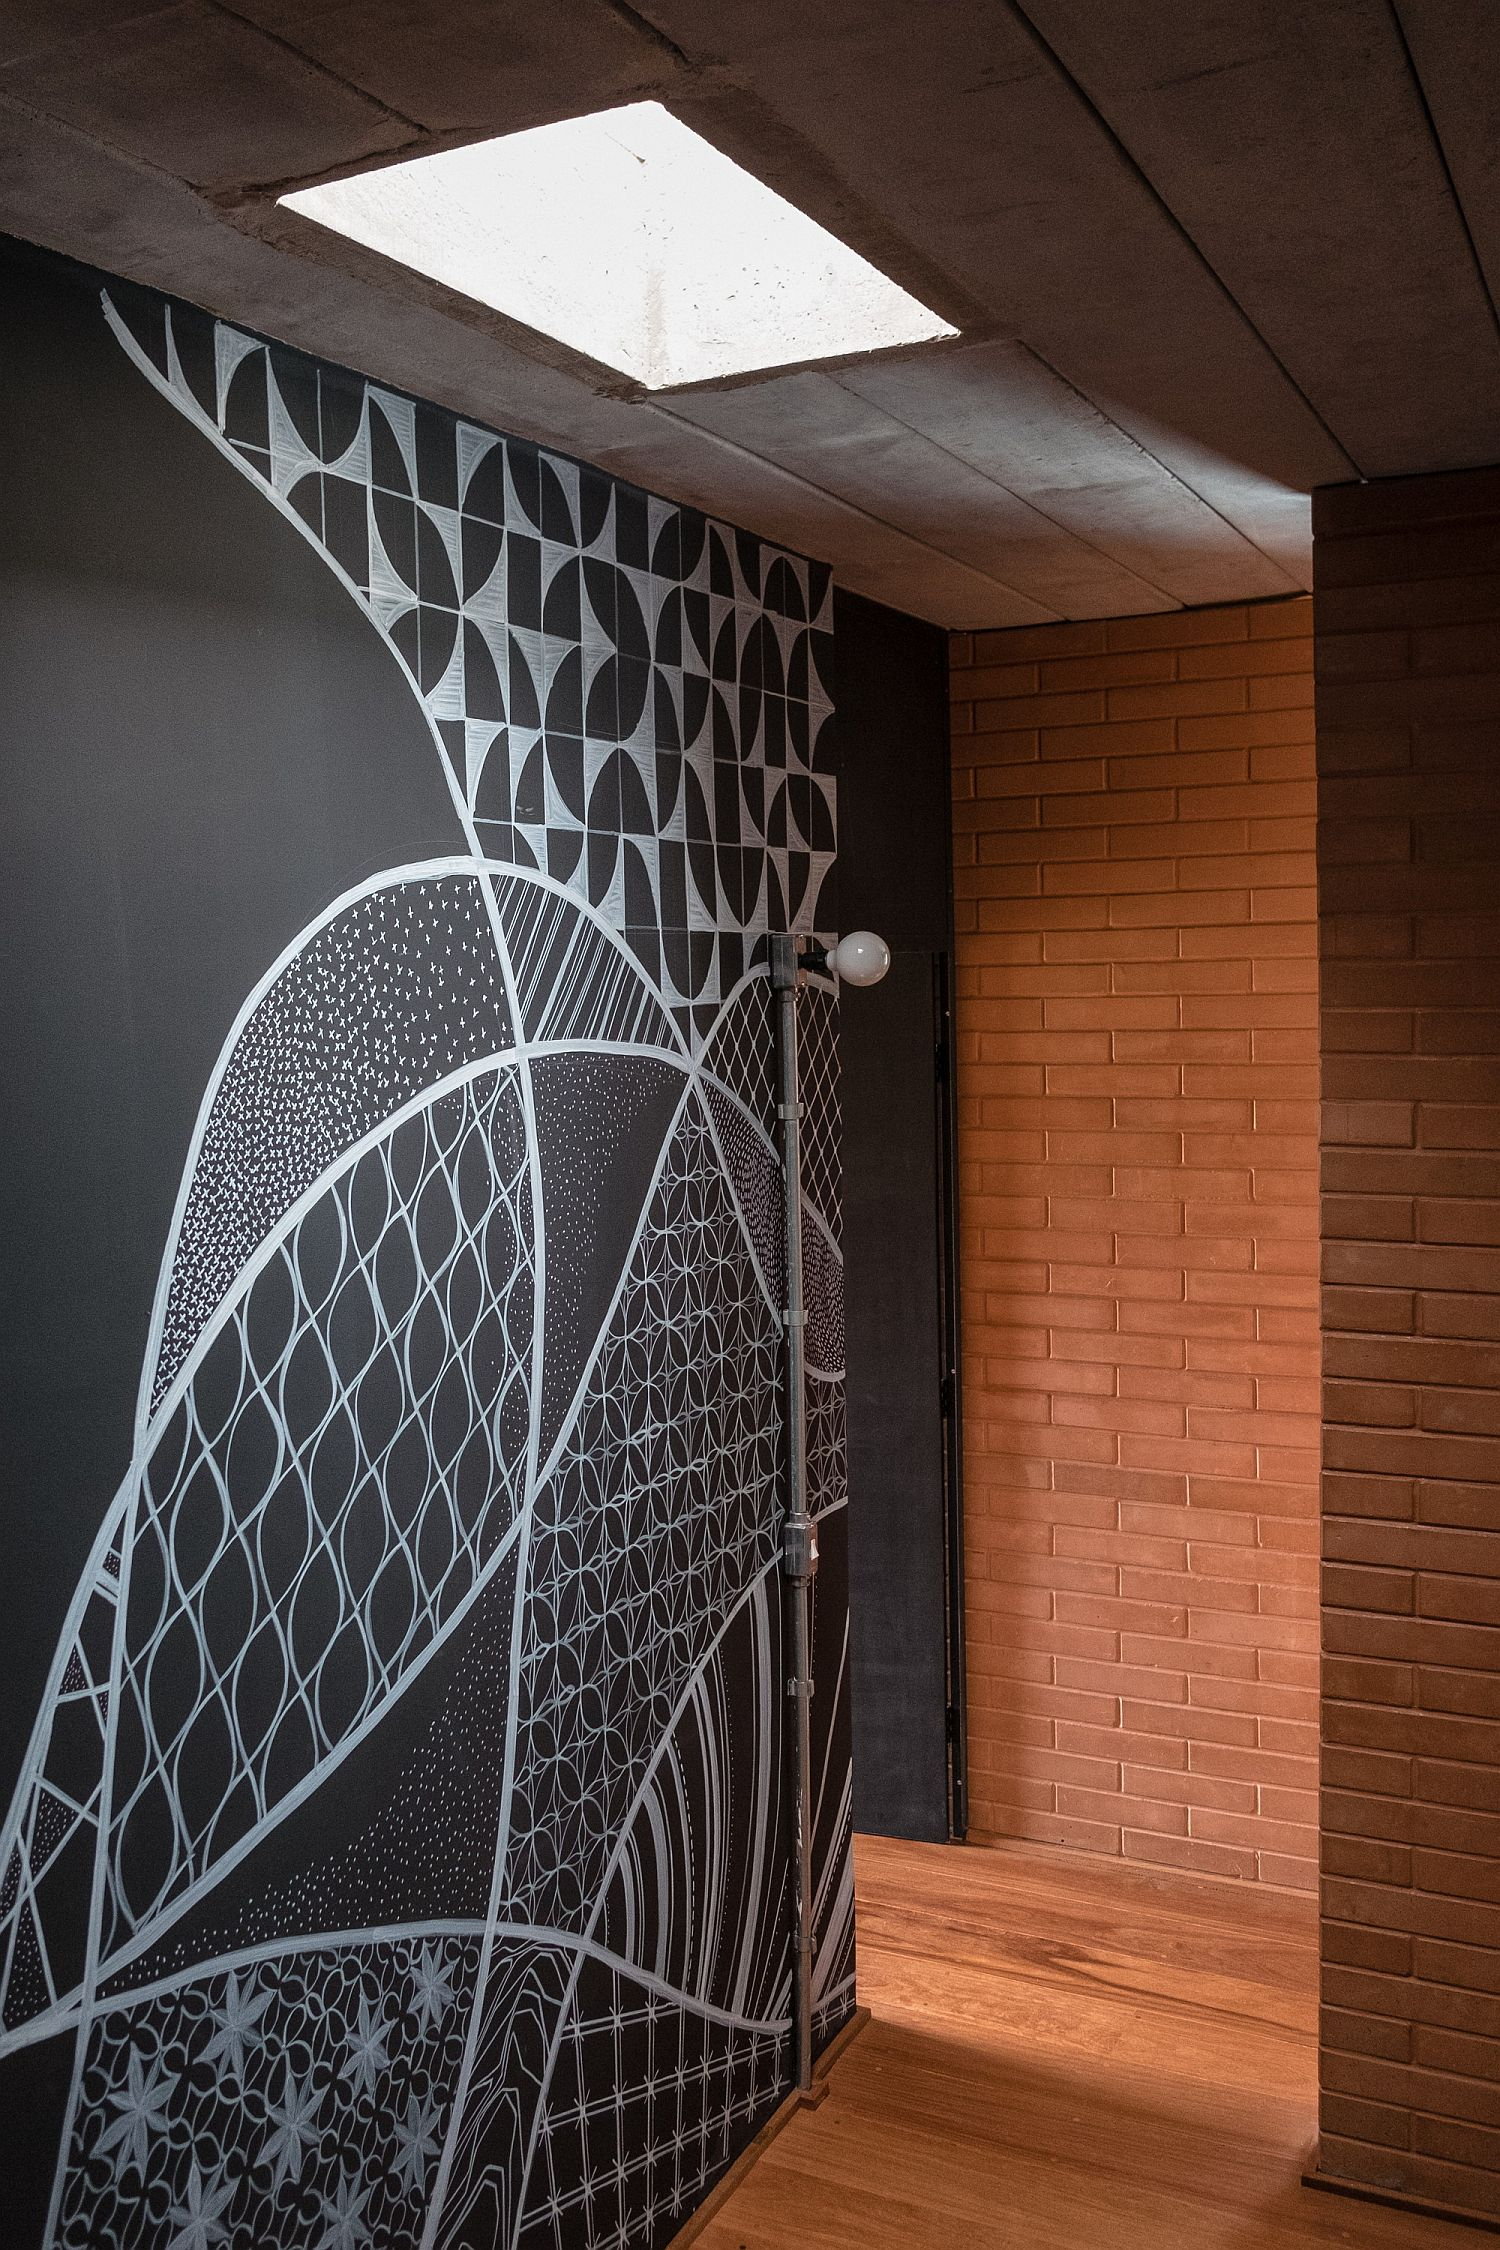 Skylight-brings-ventilation-into-the-innovative-Brazilian-home